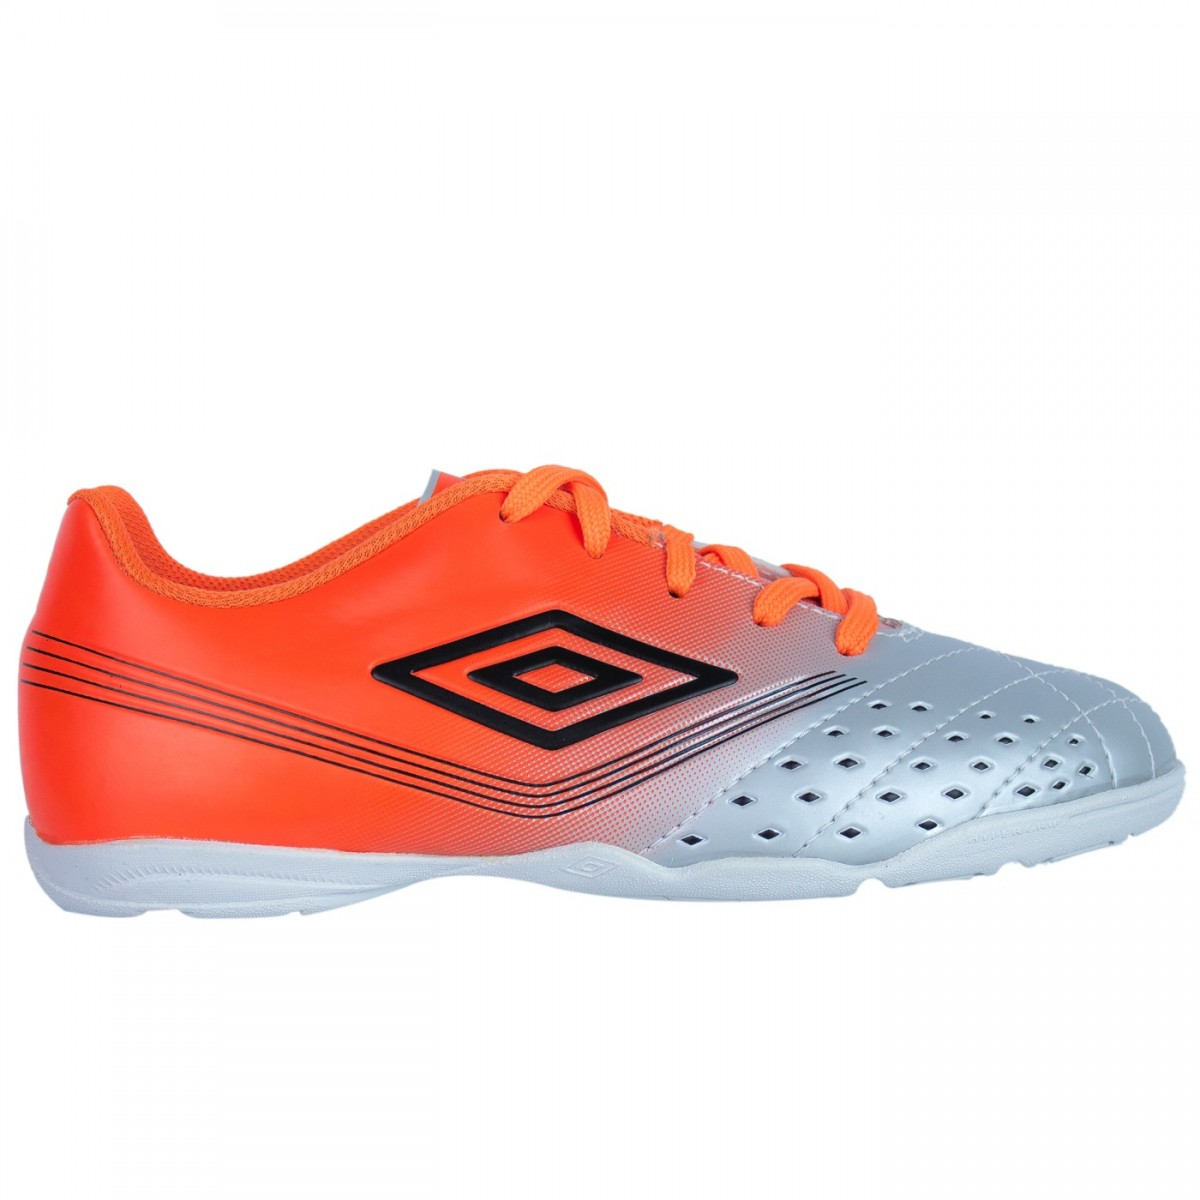 Bizz Store - Chuteira Futsal Infantil Masculina Umbro Indoor 9f93f8e2ca621